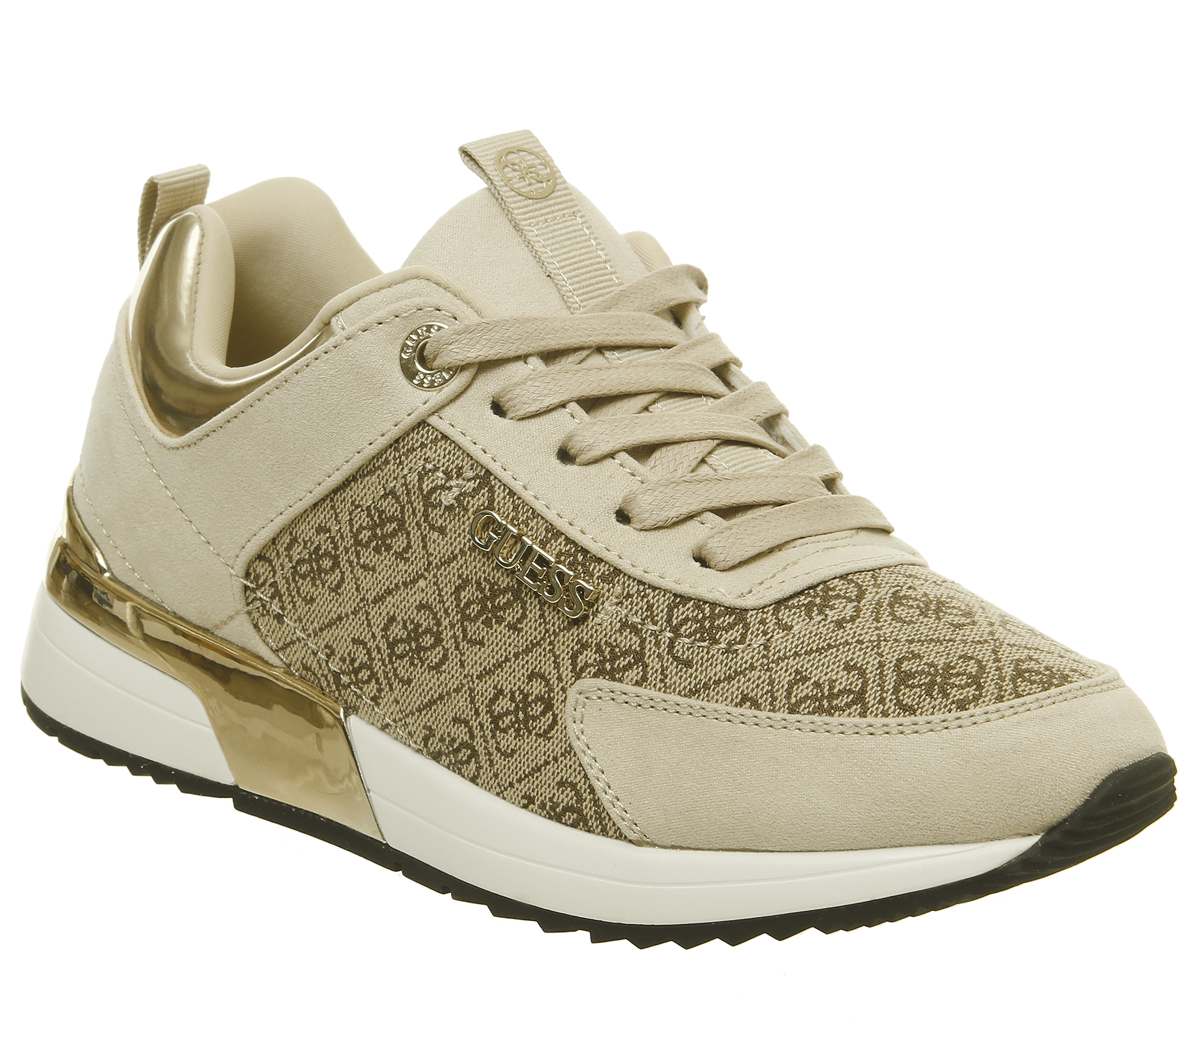 5be2b4b6397 Womens-Guess-Marlyn-Sneakers-Beige-Logo-Flats thumbnail 9